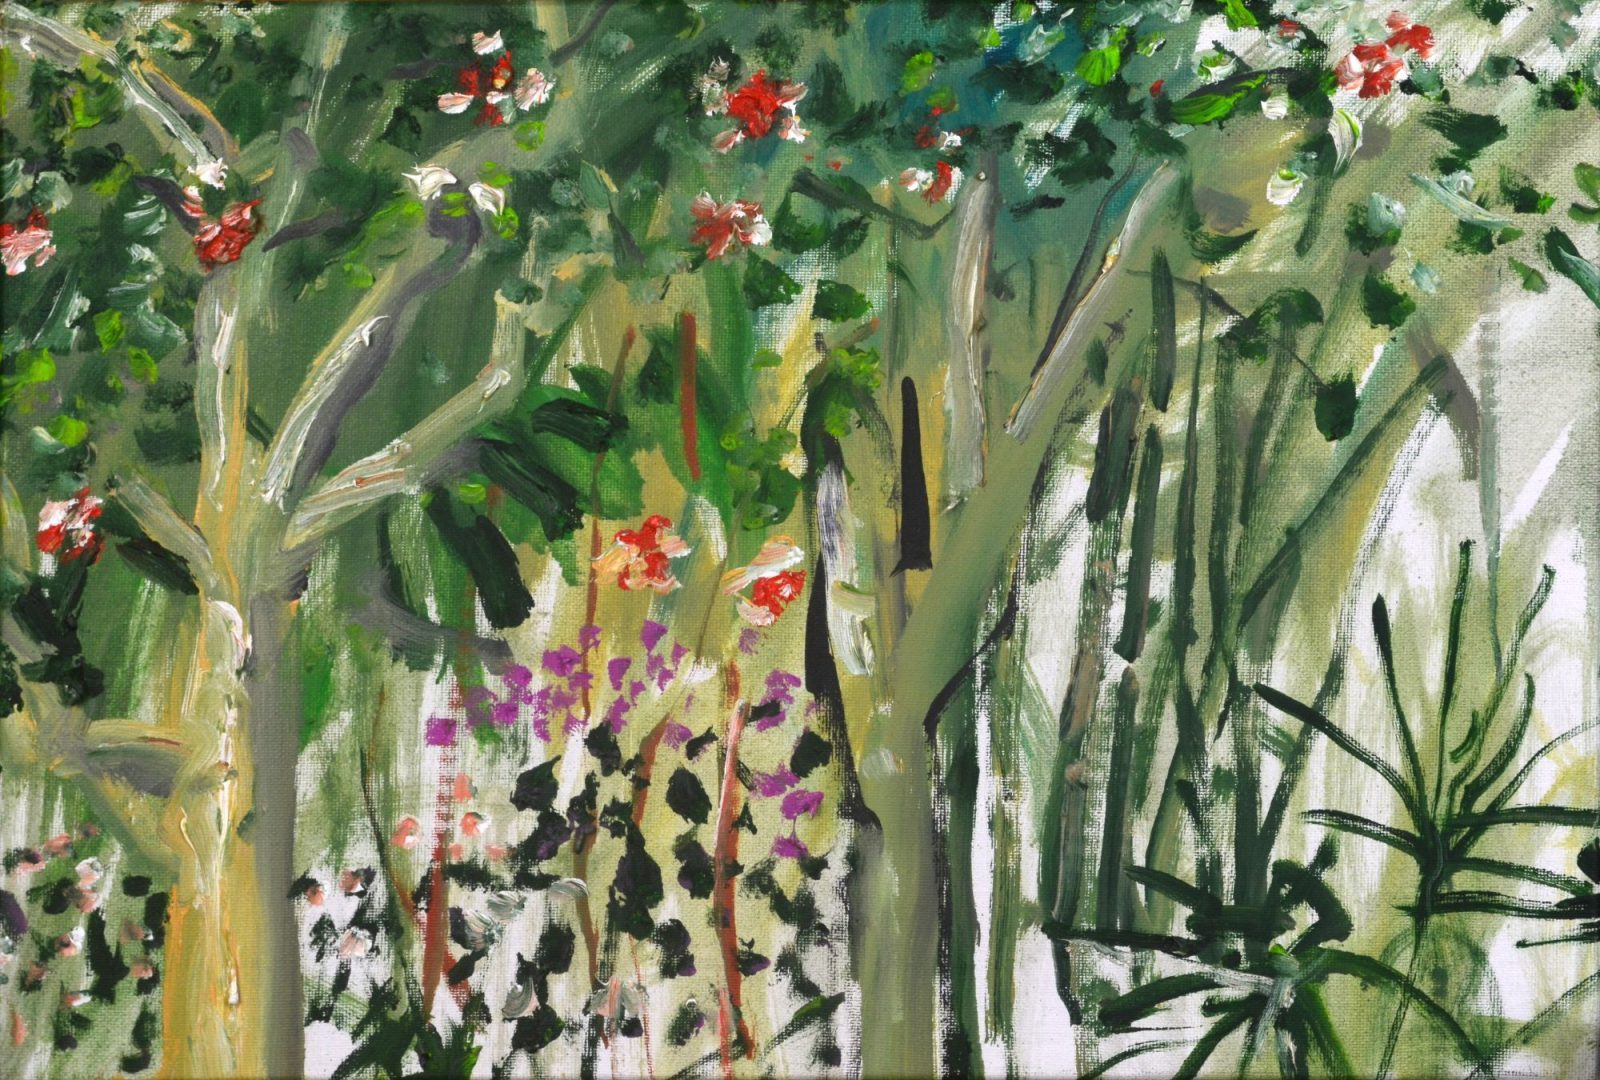 franyo aatoth: Garden Series 5.